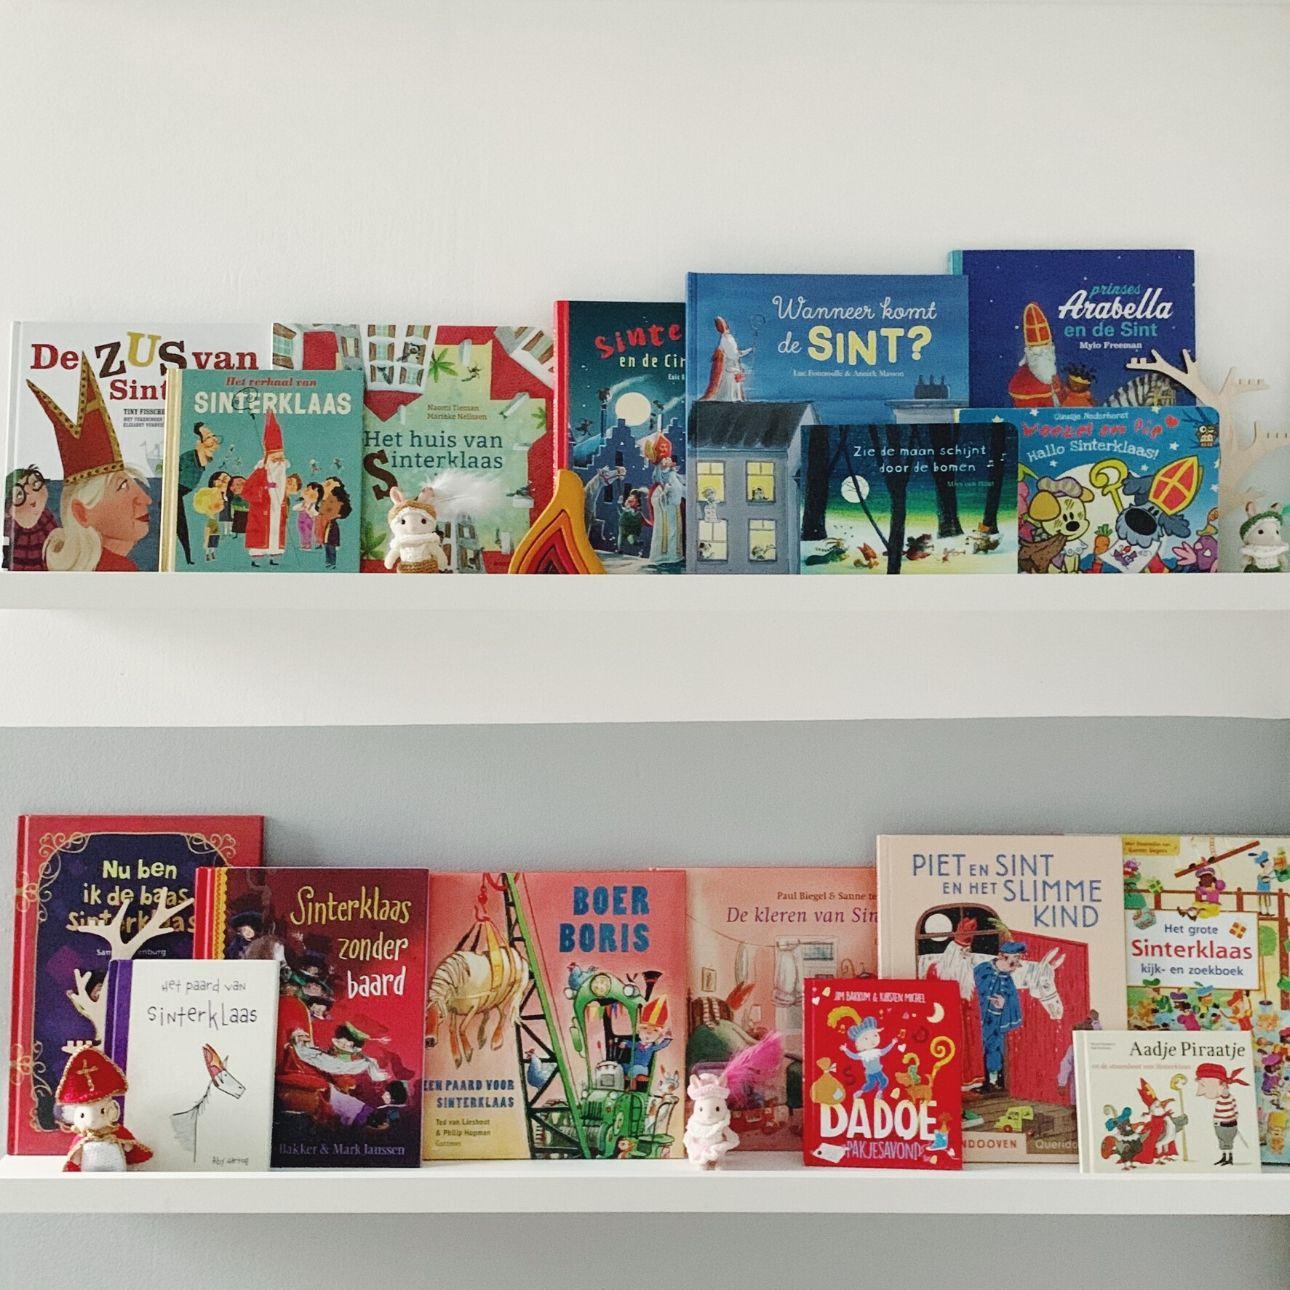 Sinterklaas kinderboeken roetveegpieten